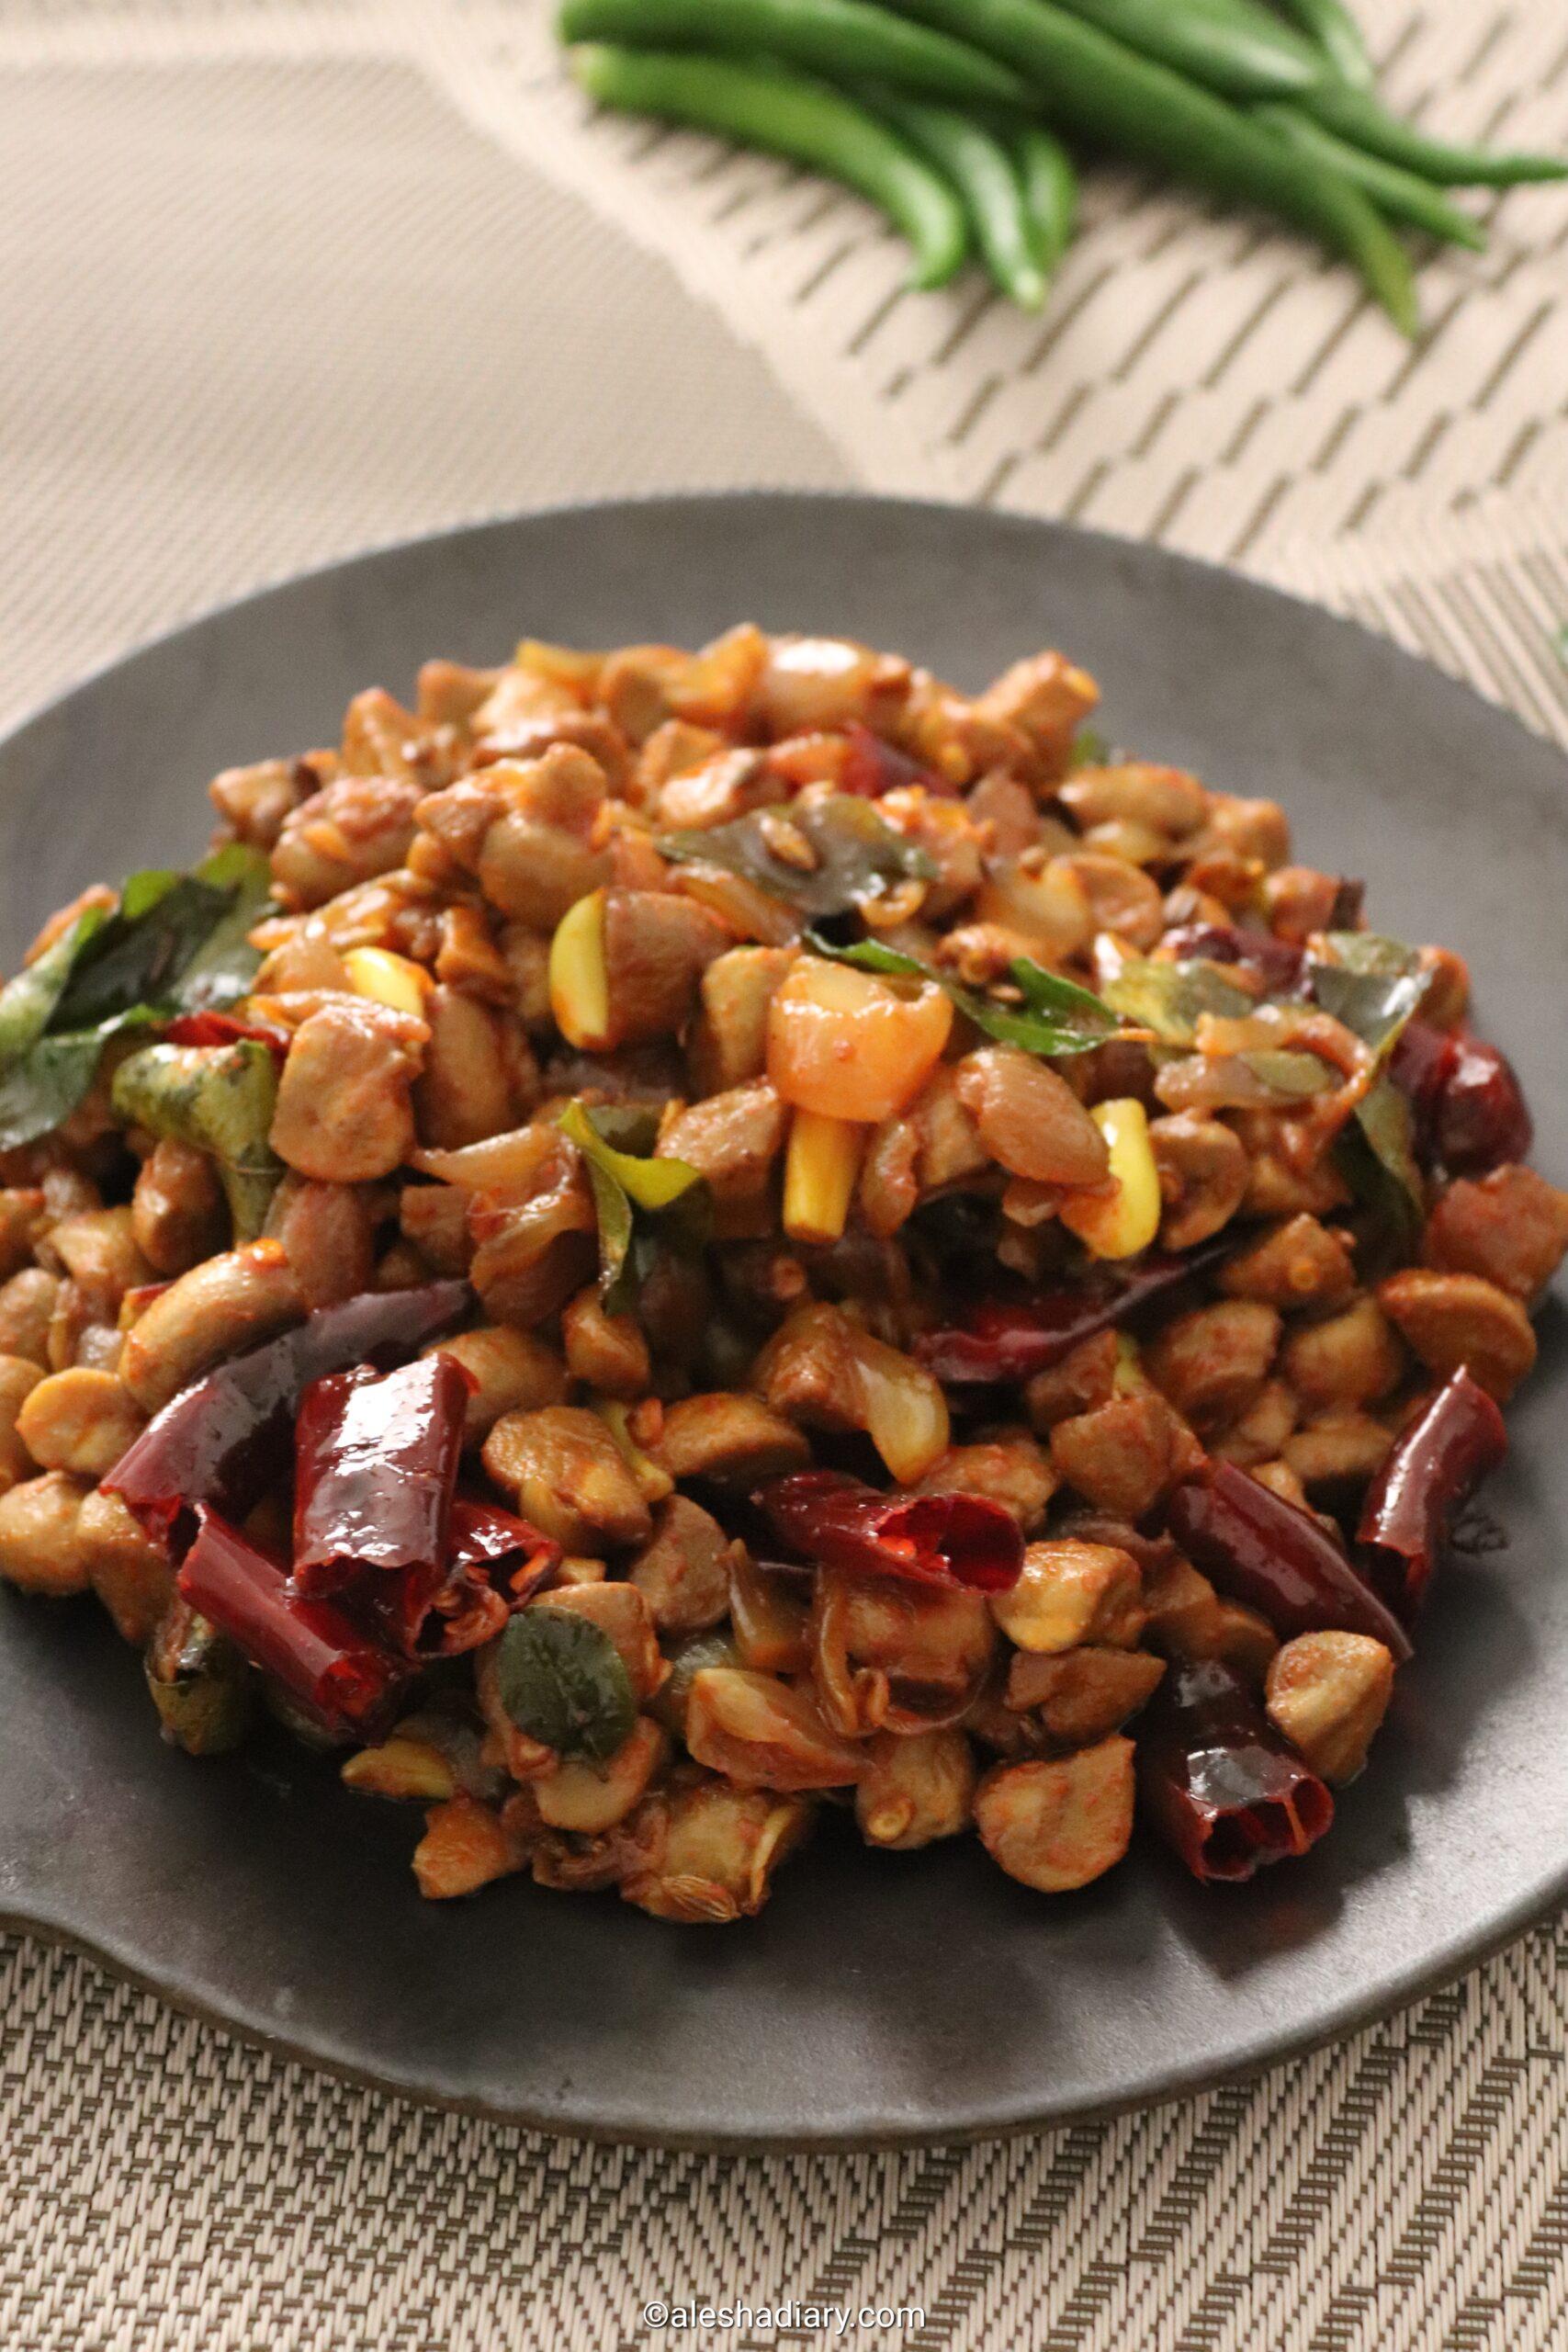 Mushroom uppu kari – Mushroom stir-fry